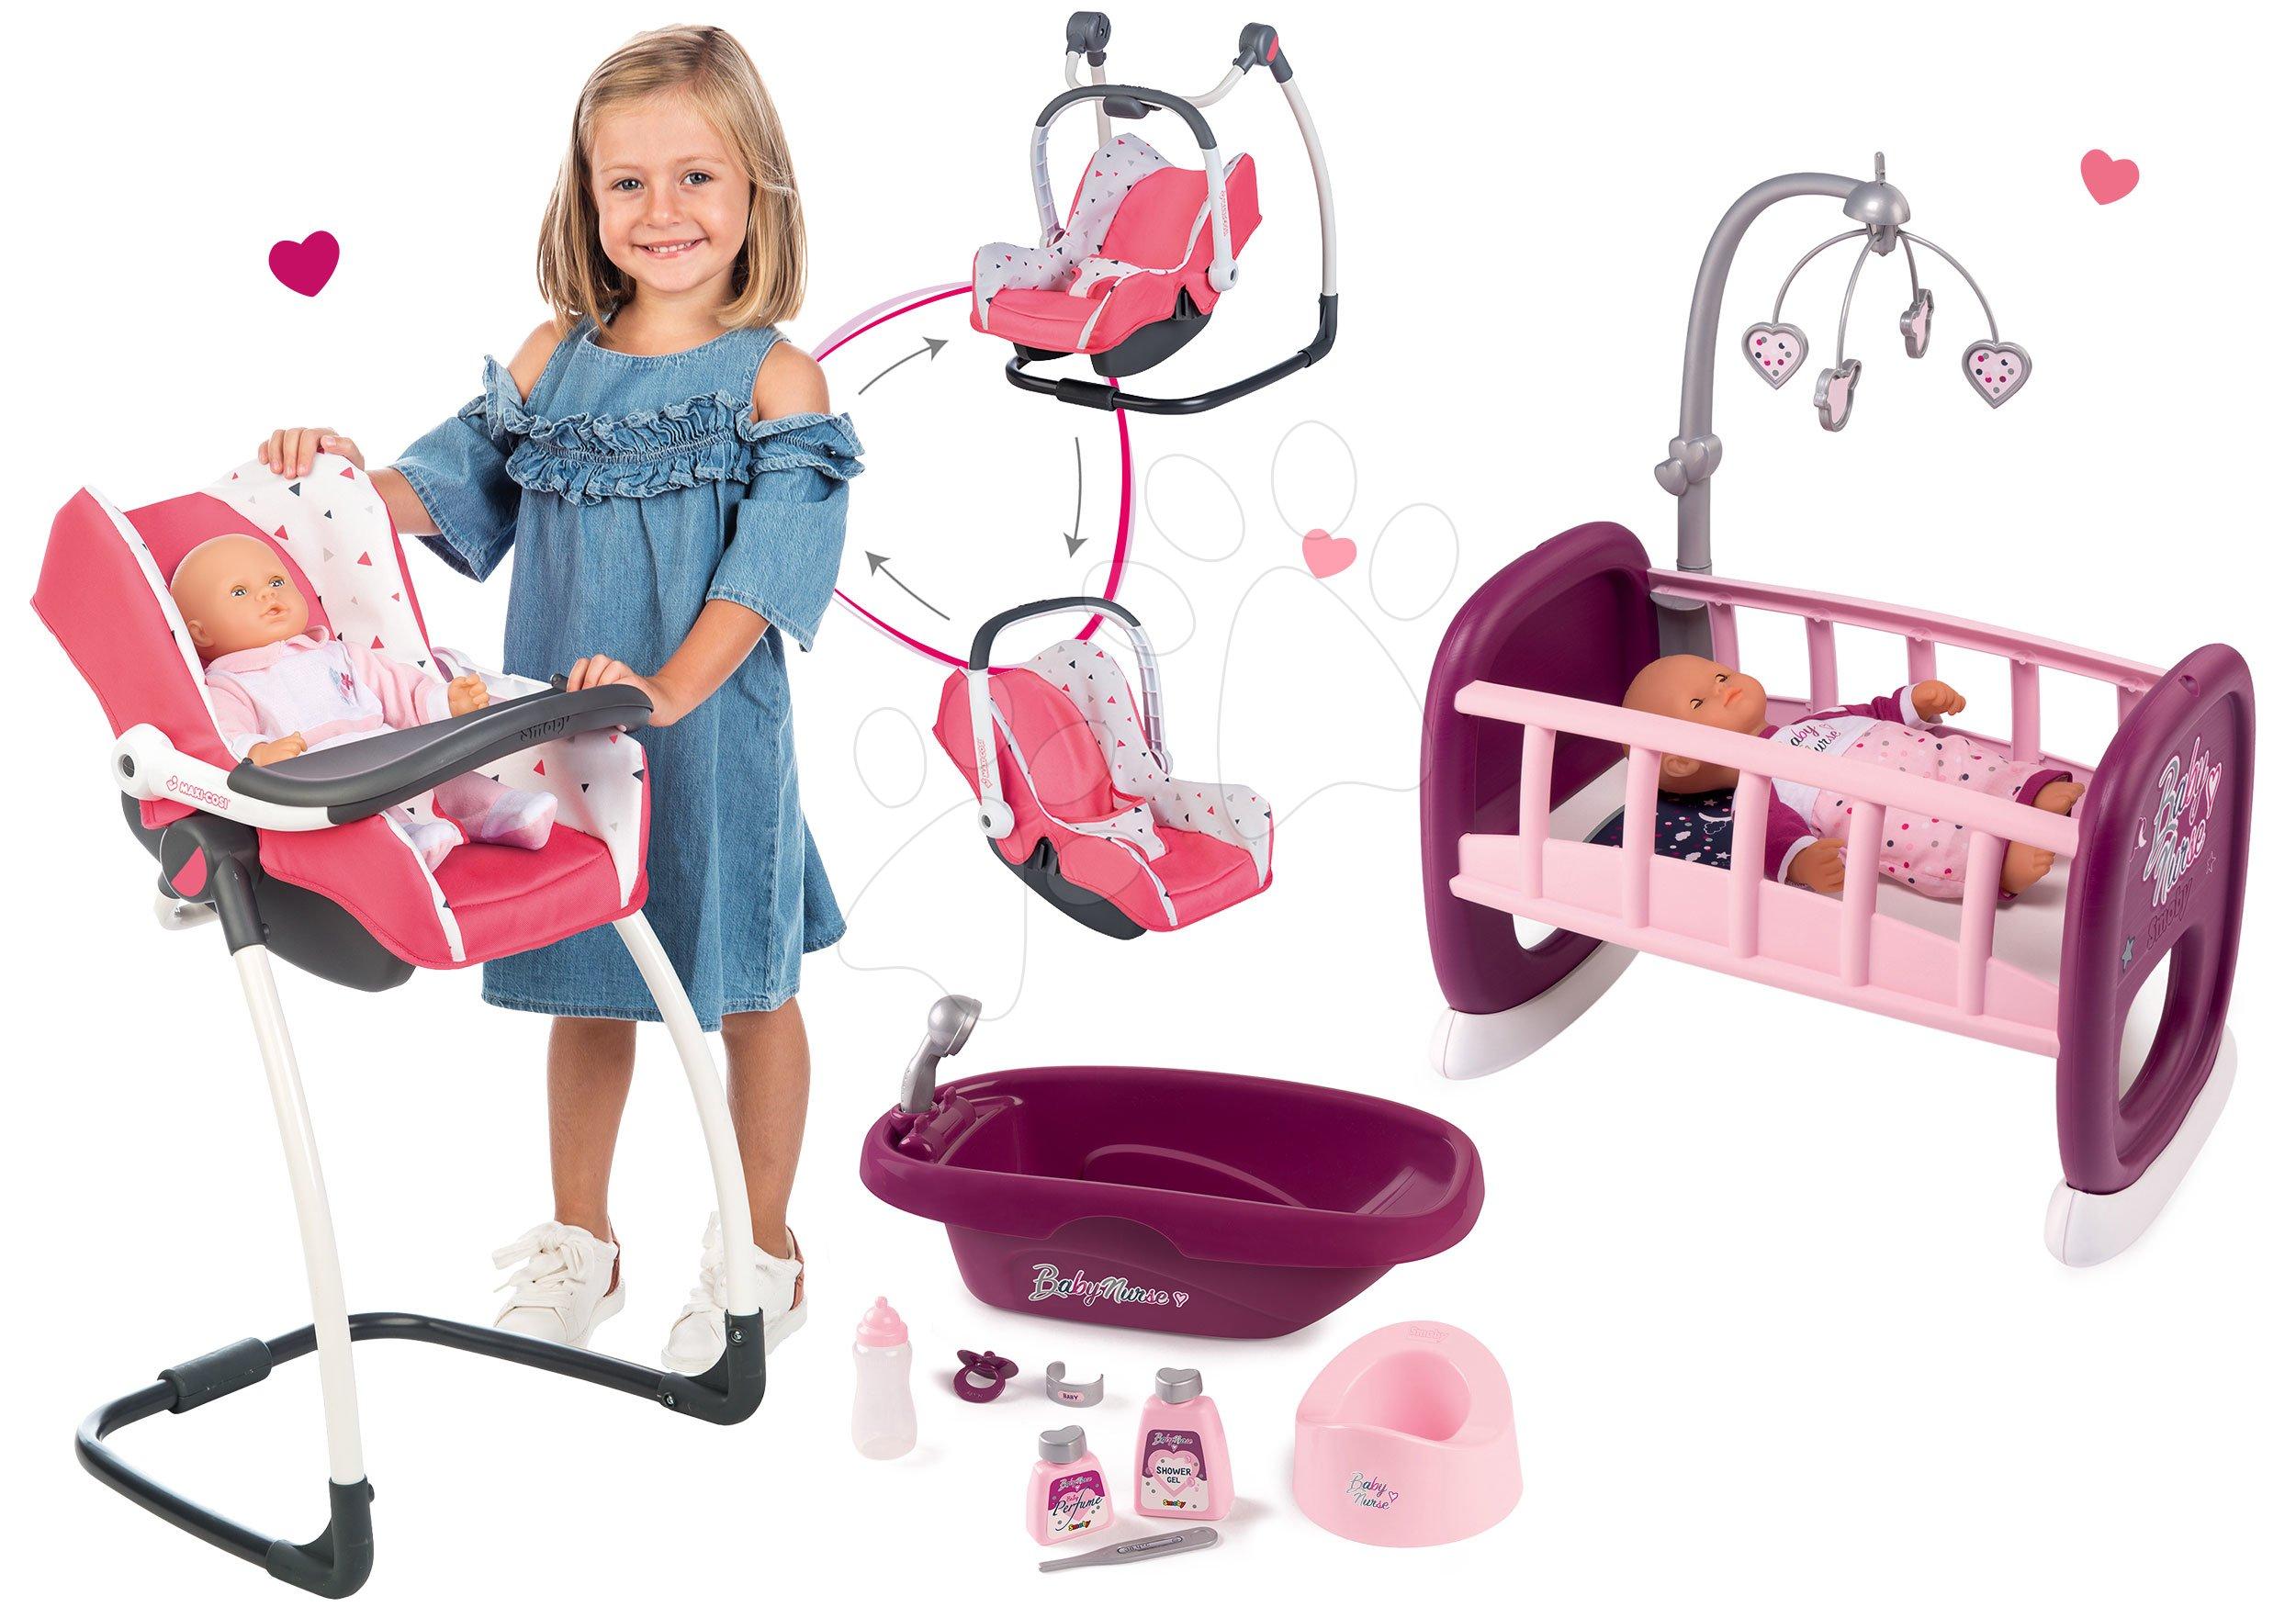 Set jídelní židle s autosedačkou a houpacka Trio Pastel Maxi Cosi&Quinny Smoby a panenka Baby Nurse s vaničkou s postýlkou